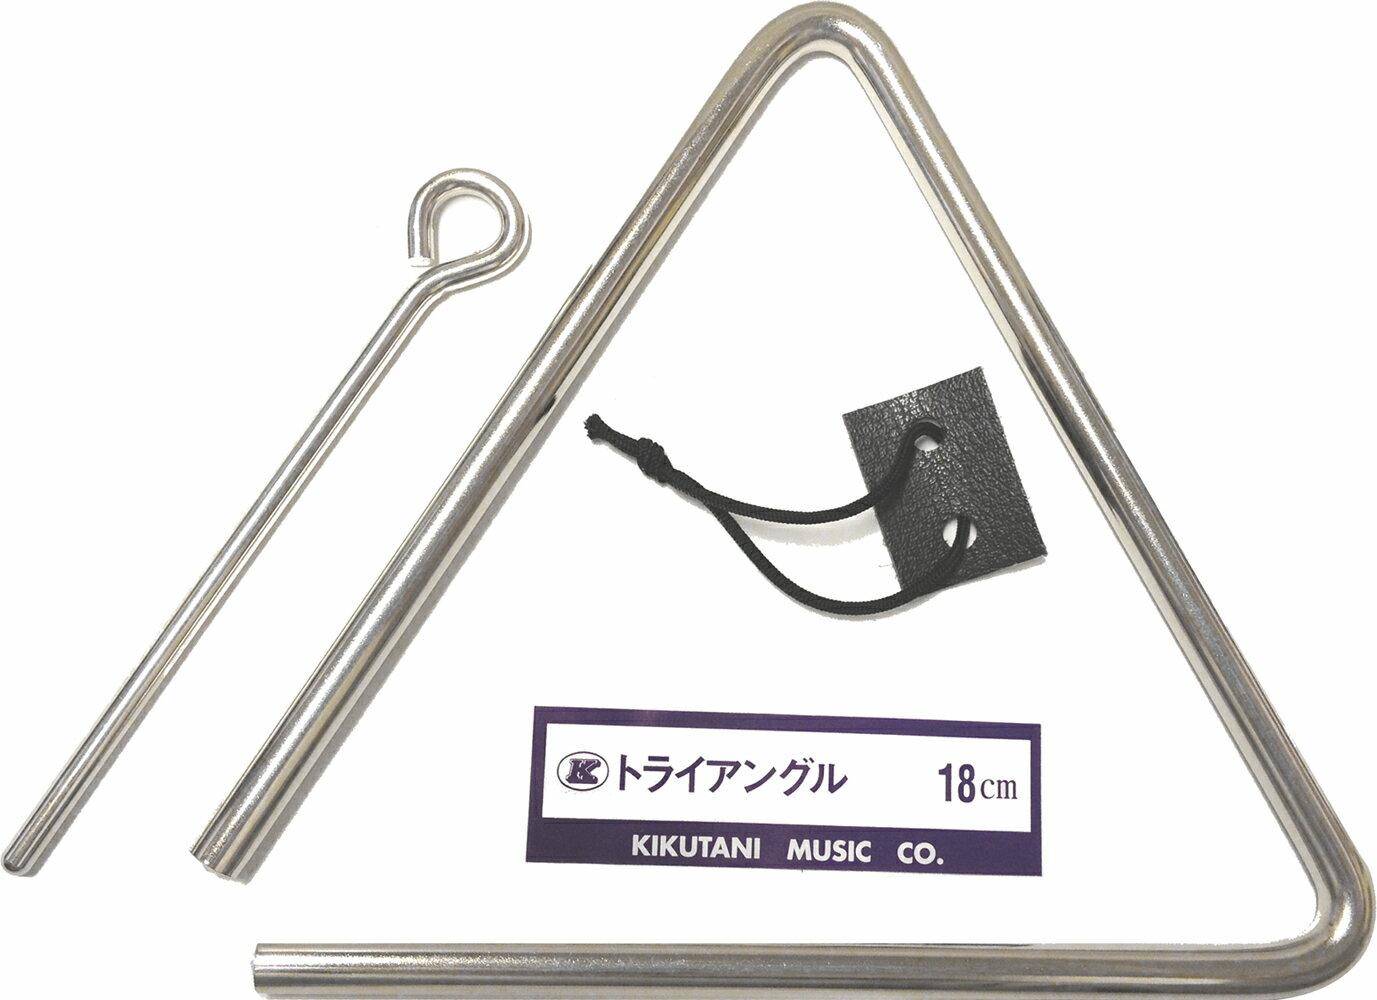 Kikutani ( キクタニ ) トライアングル 18cm 三角形 打楽器 金属棒 ( バチ ) 吊り皮 ヒモ付き 合奏 パーカッション 楽器 T-18 triangle (北海道/沖縄/離島/同梱不可=送料実費請求)